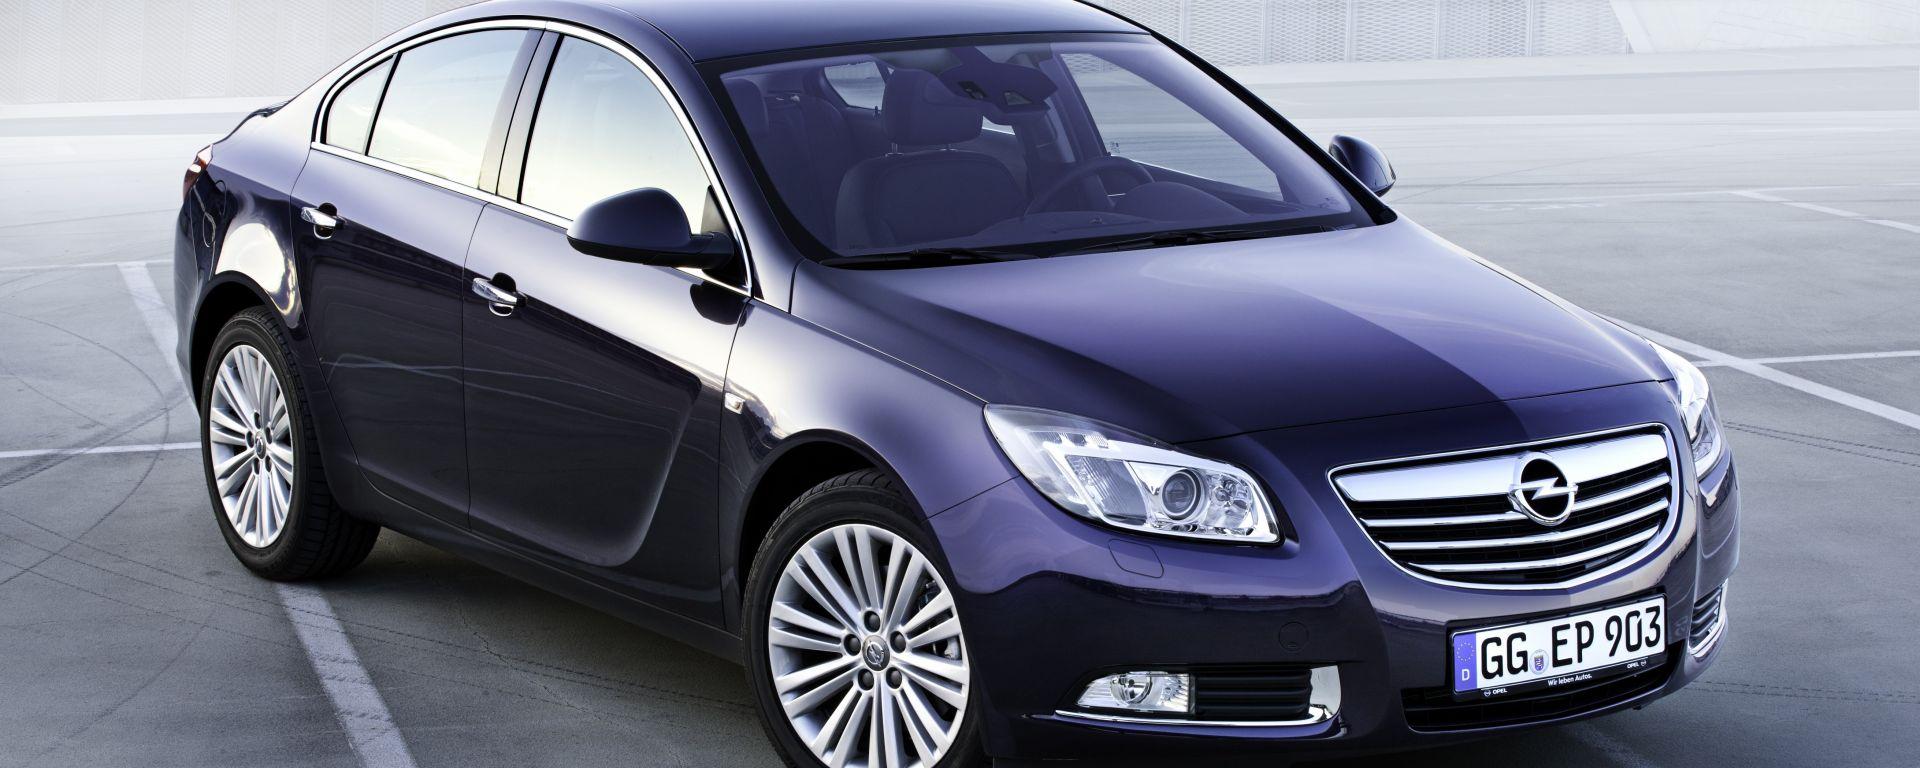 Opel Insignia my 2012